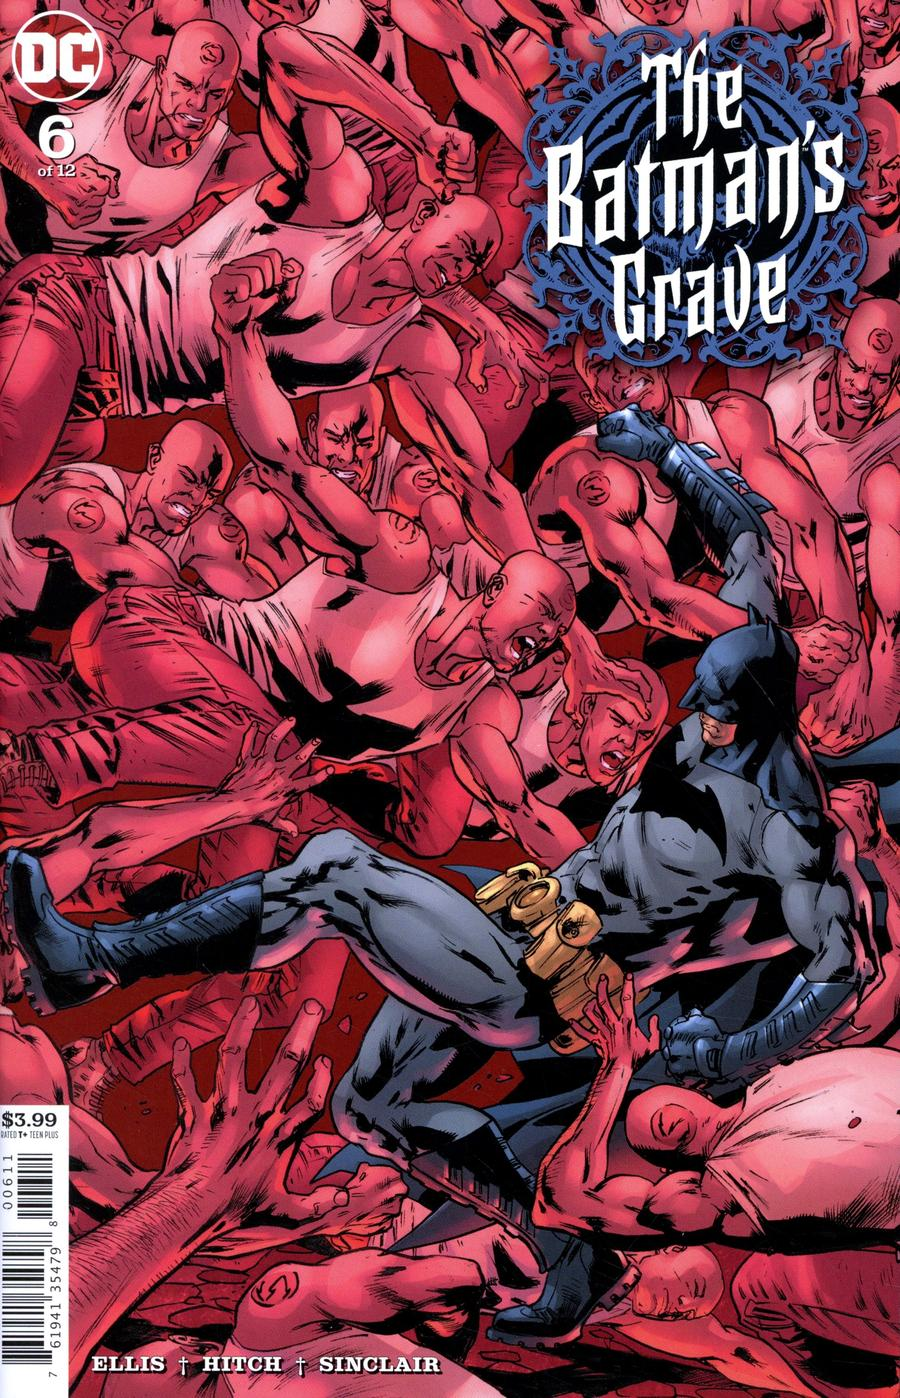 Batmans Grave #6 Cover A Regular Bryan Hitch Cover